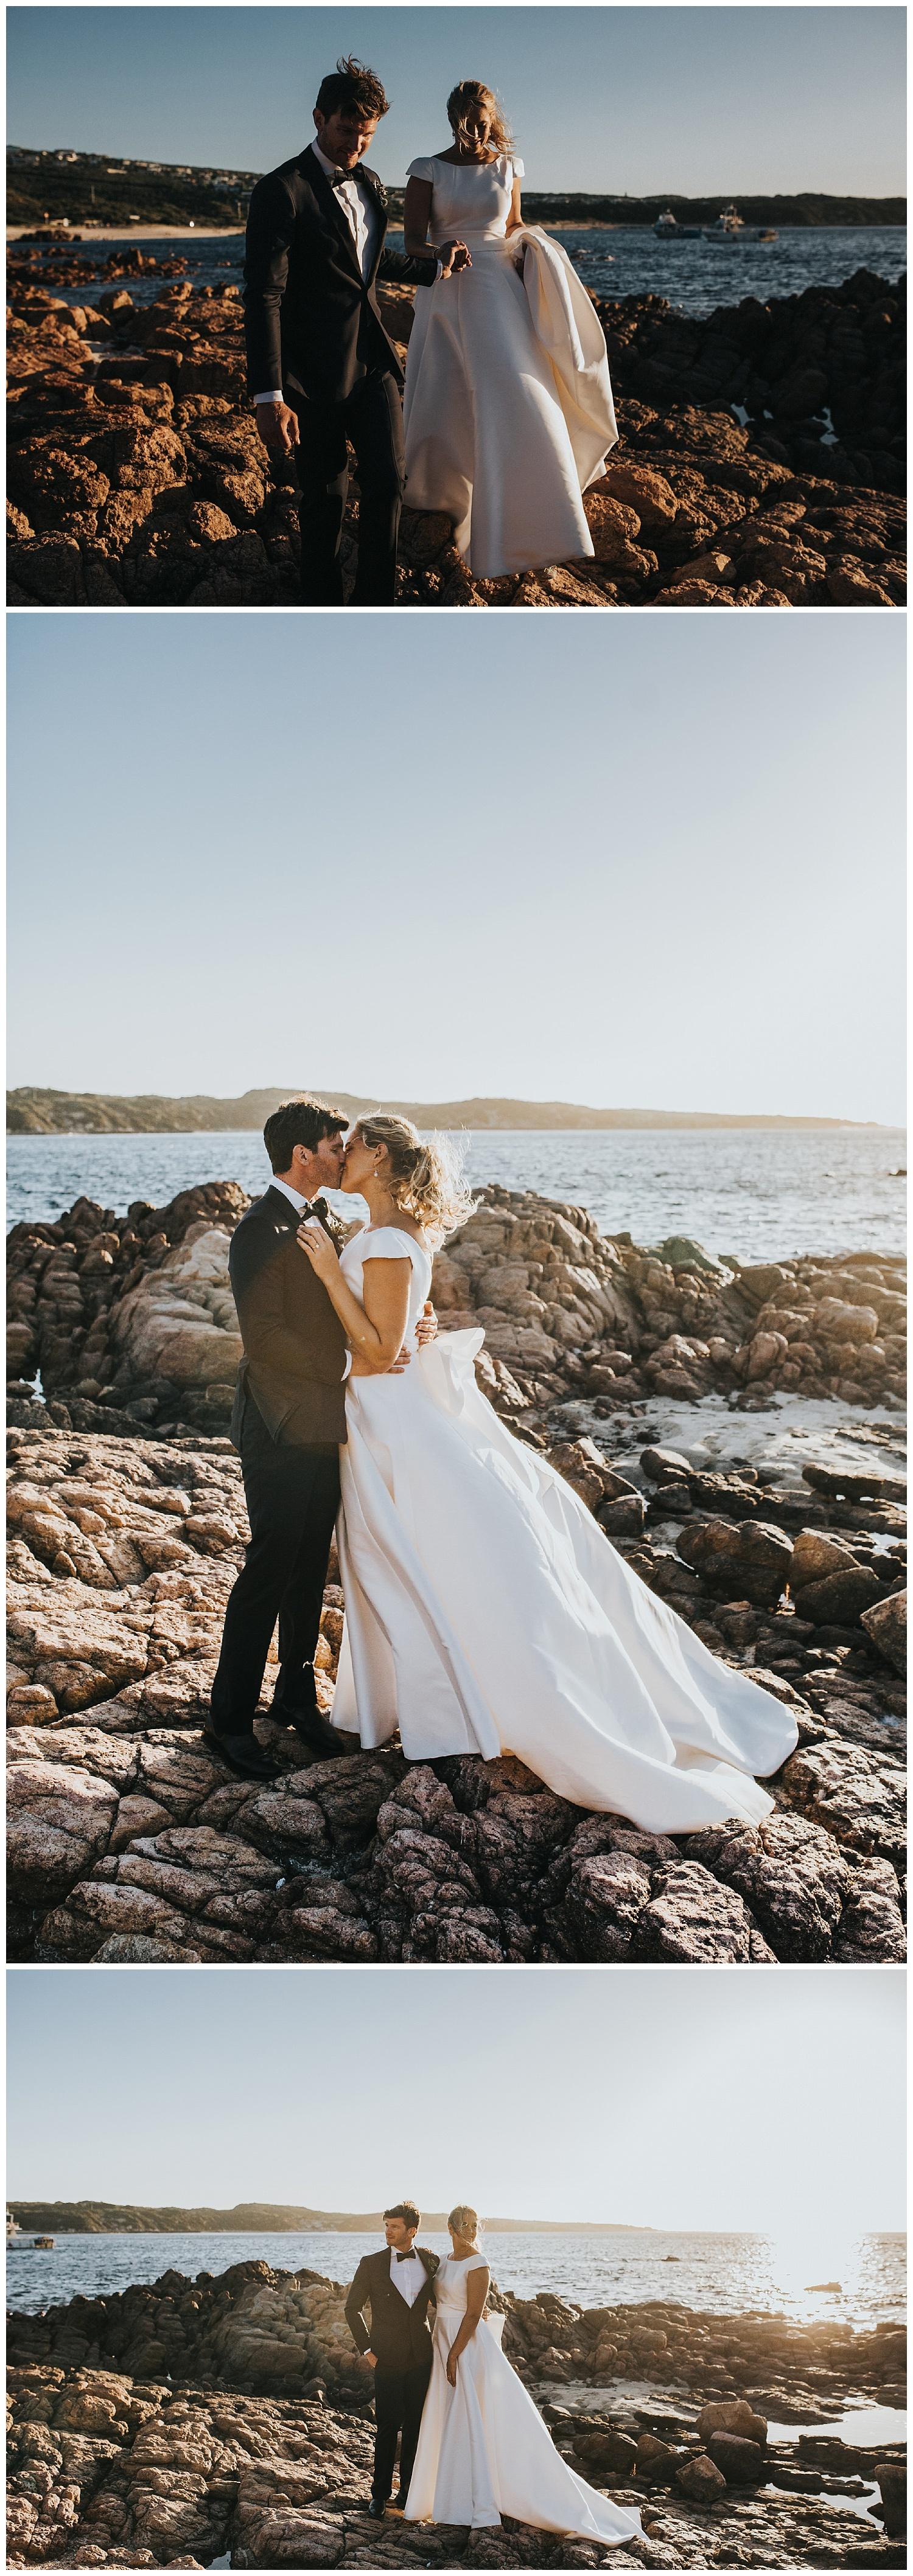 olio_bello_wedding_keeper_creative_032.JPG